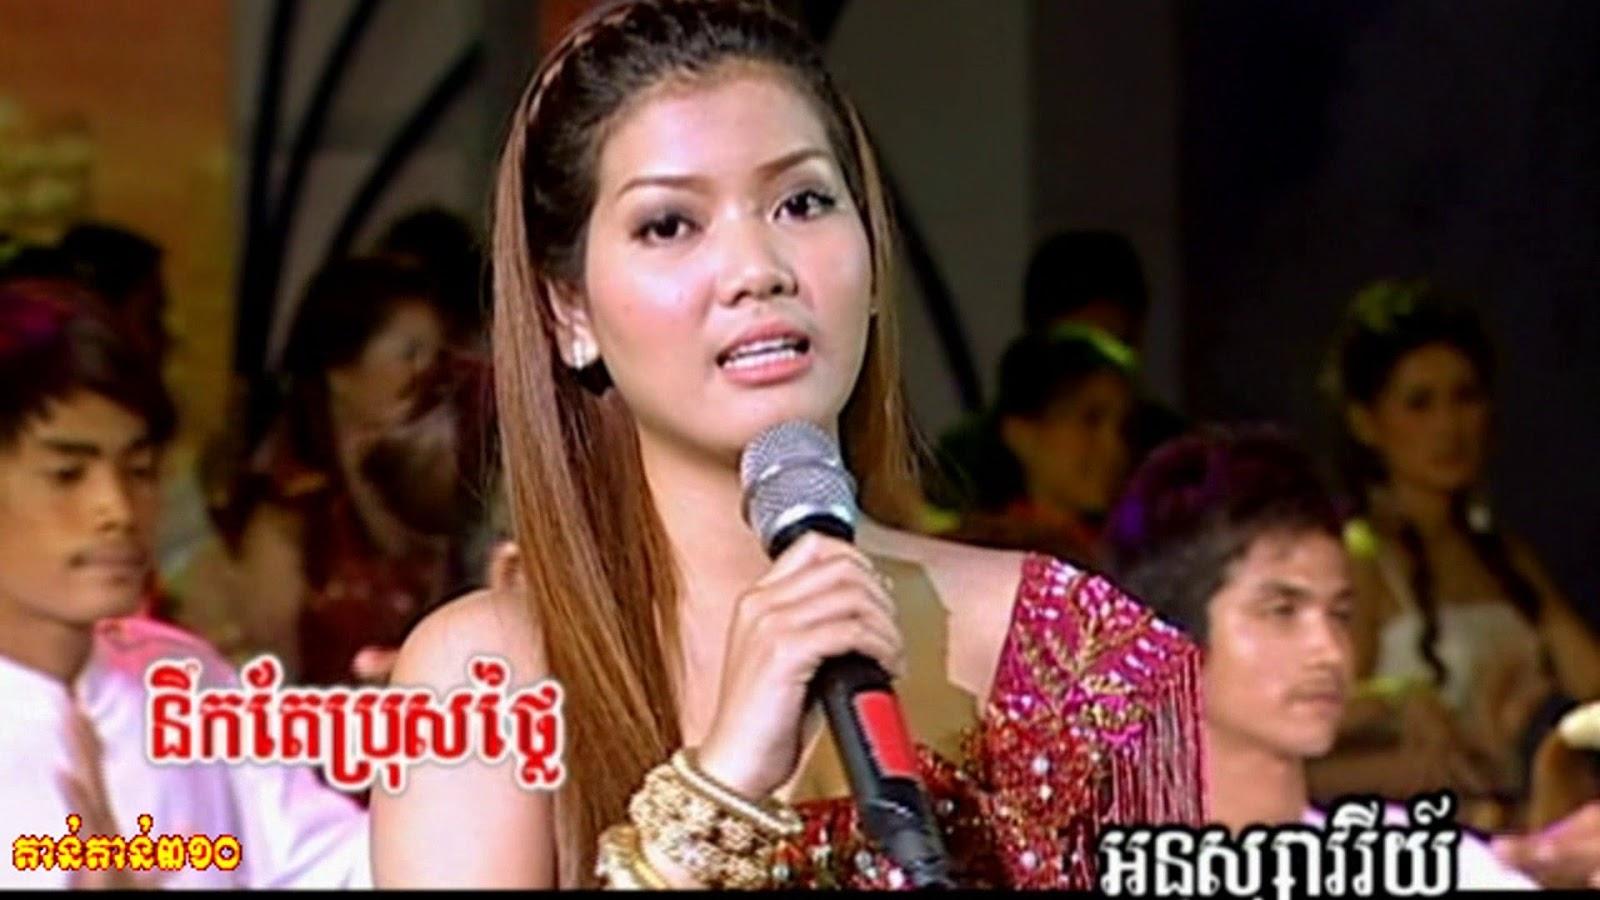 Khmer sex actress